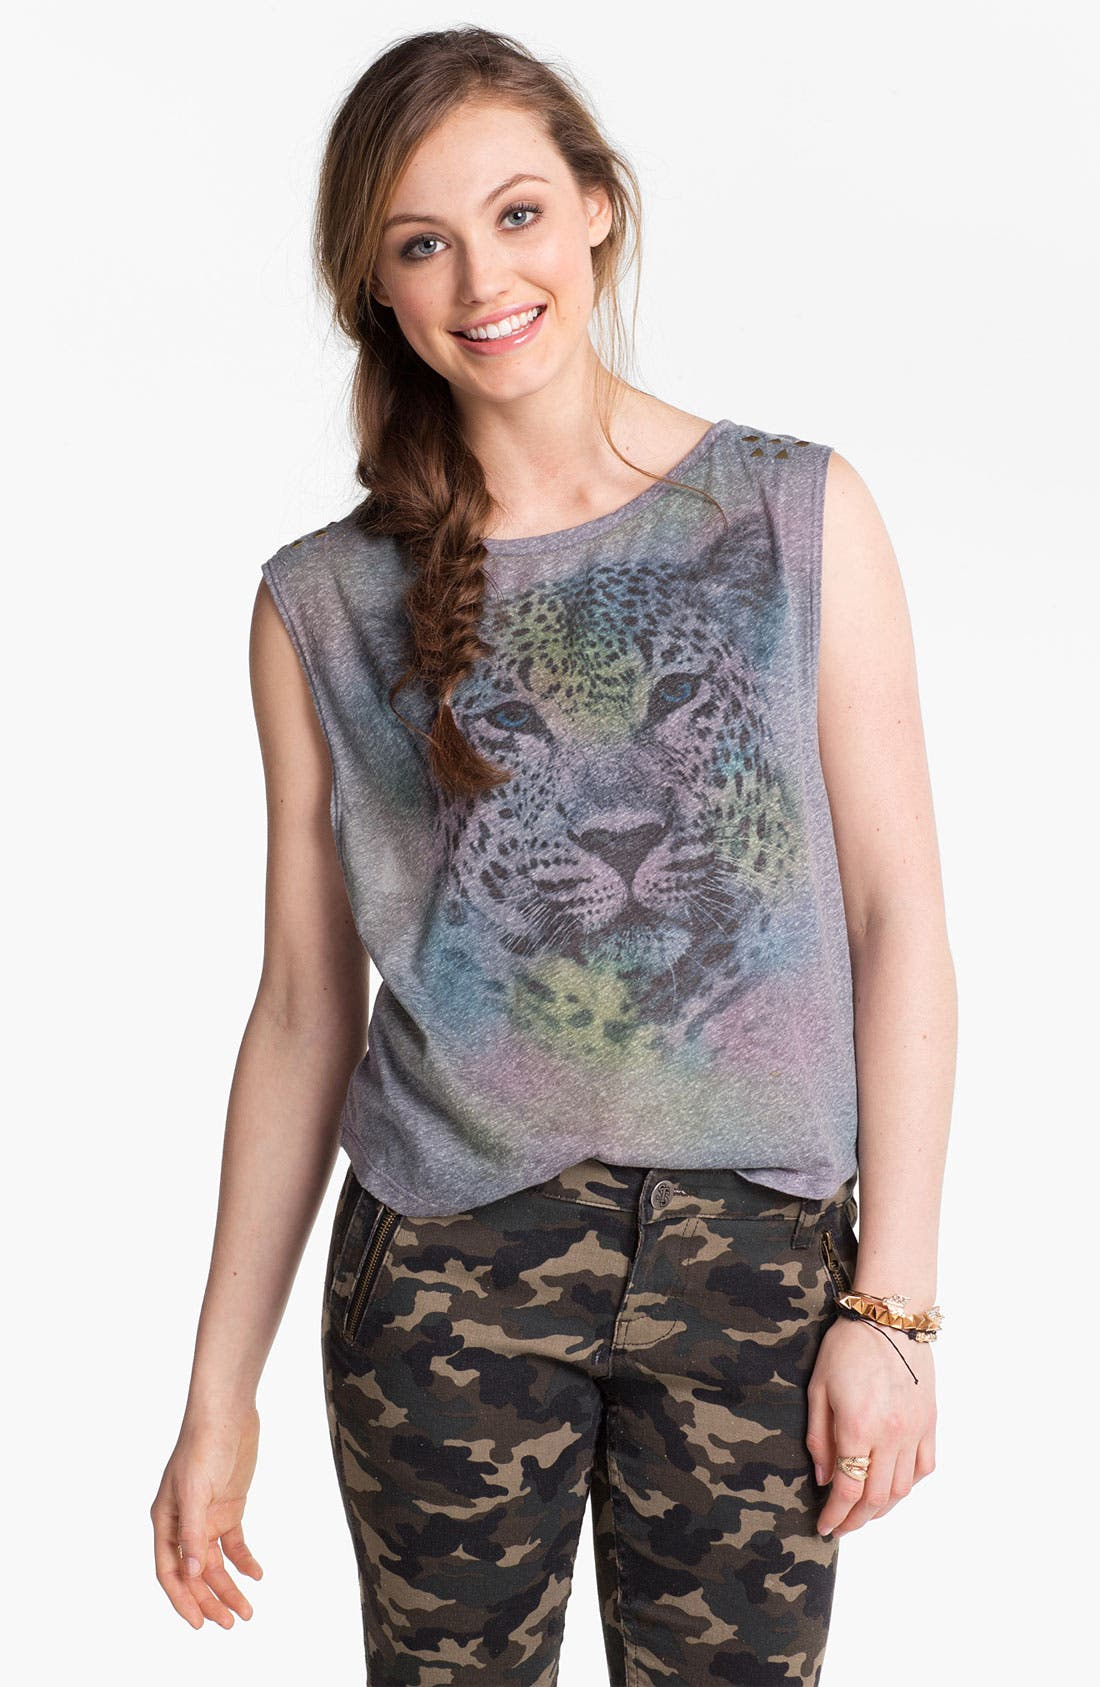 Main Image - Lush Studded Cheetah Graphic Muscle Tee (Juniors)